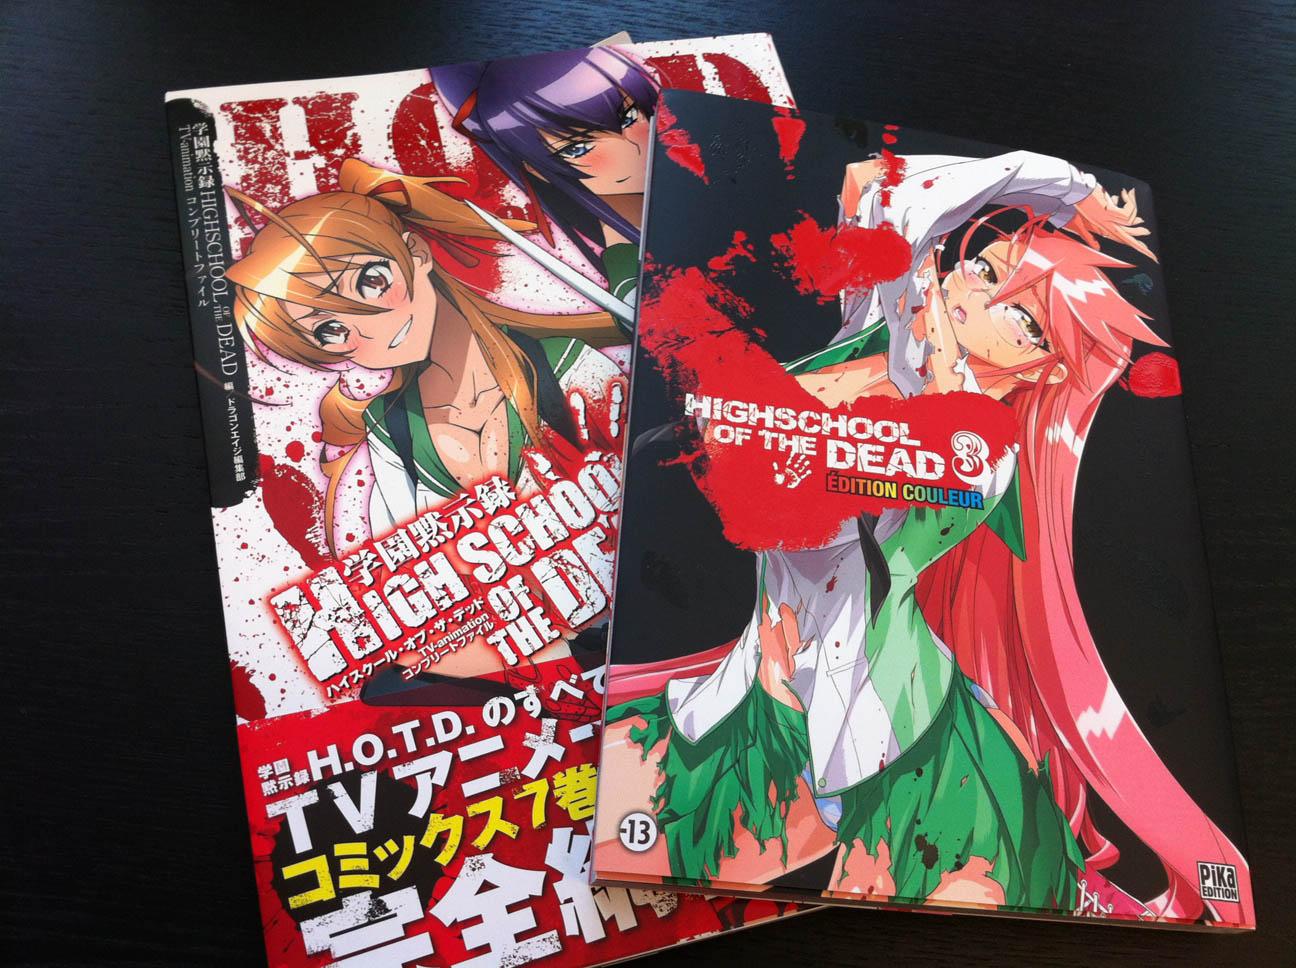 Genre Anime Highschool Of The Dead Guide High School De Sundvold